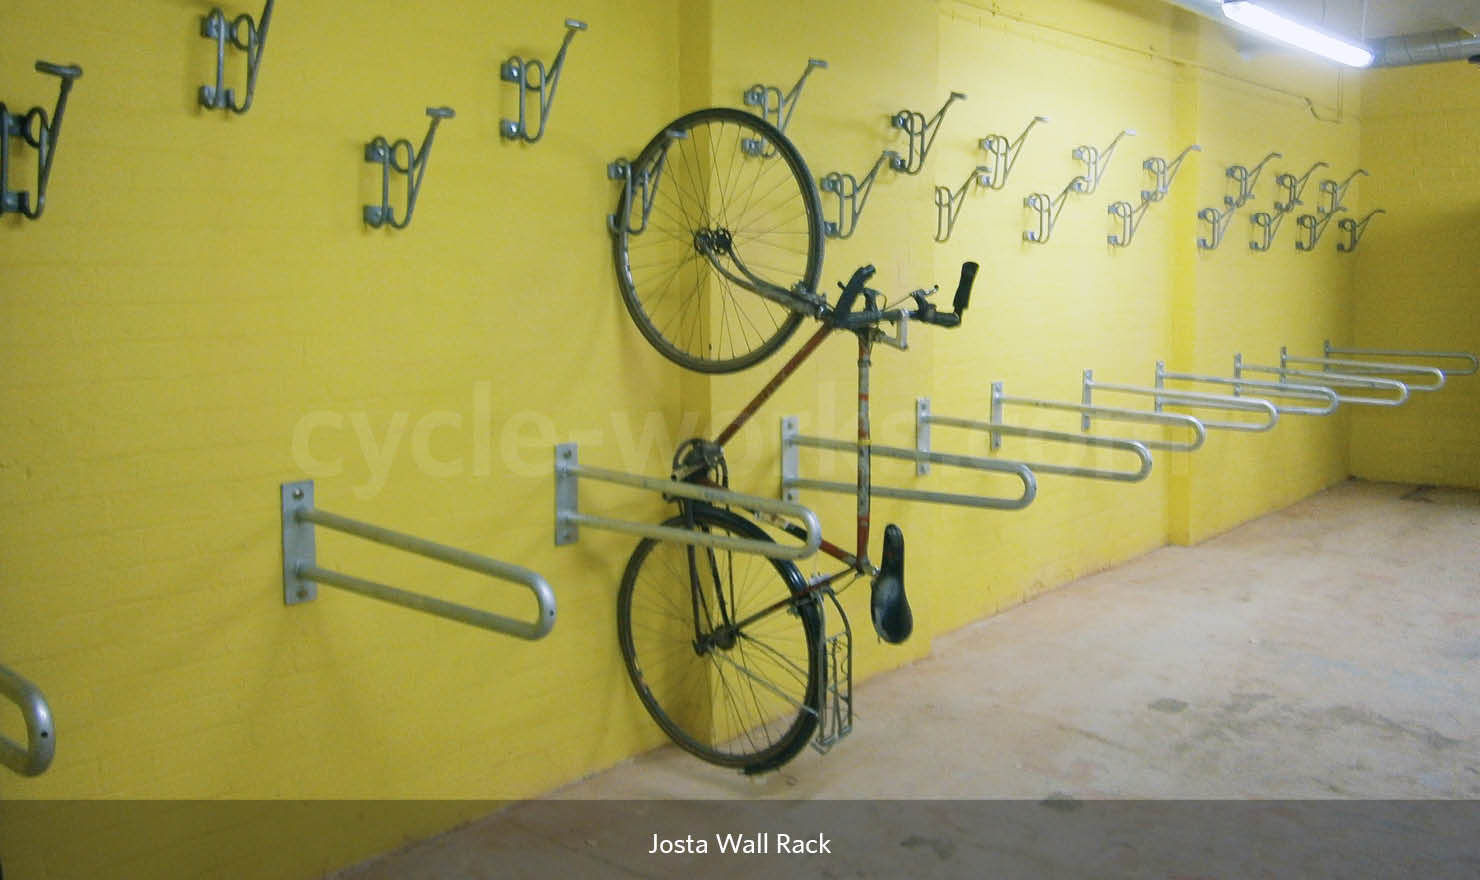 Josta Wall Rack